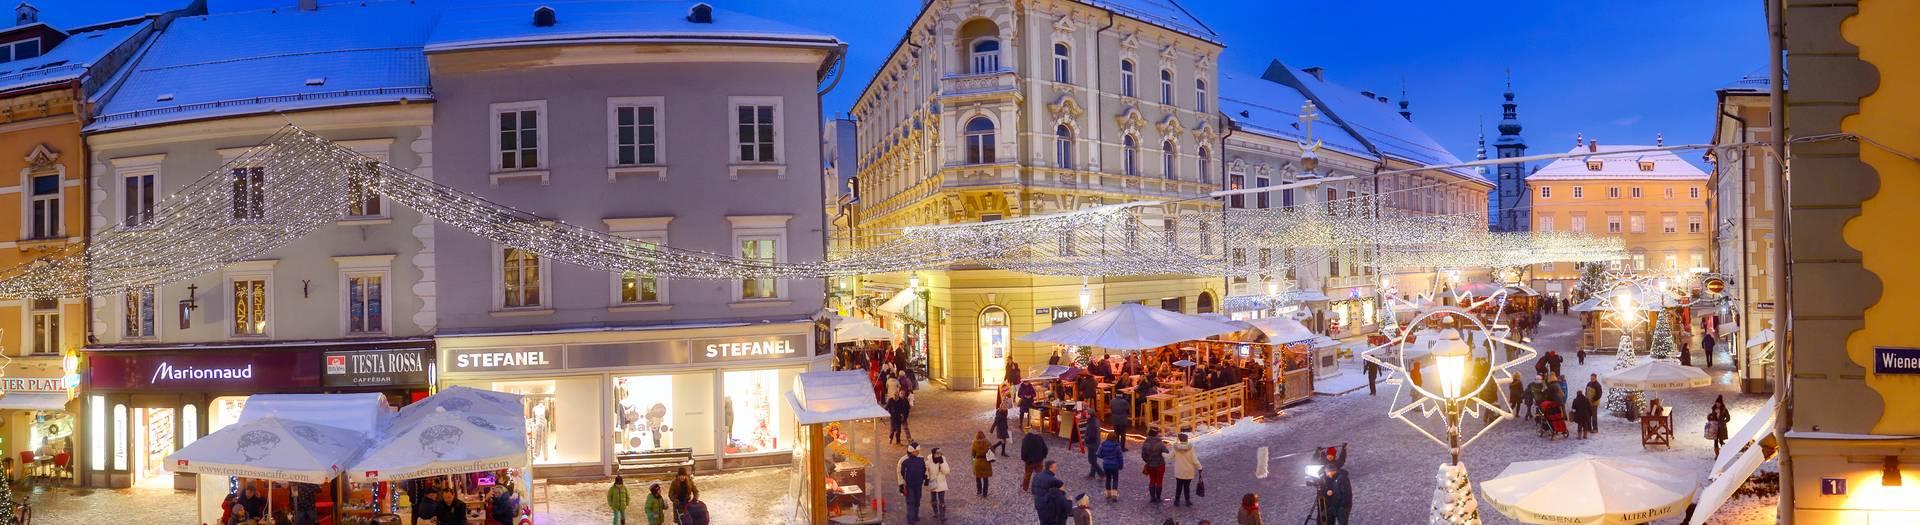 Advent Klagenfurt Alter Platz